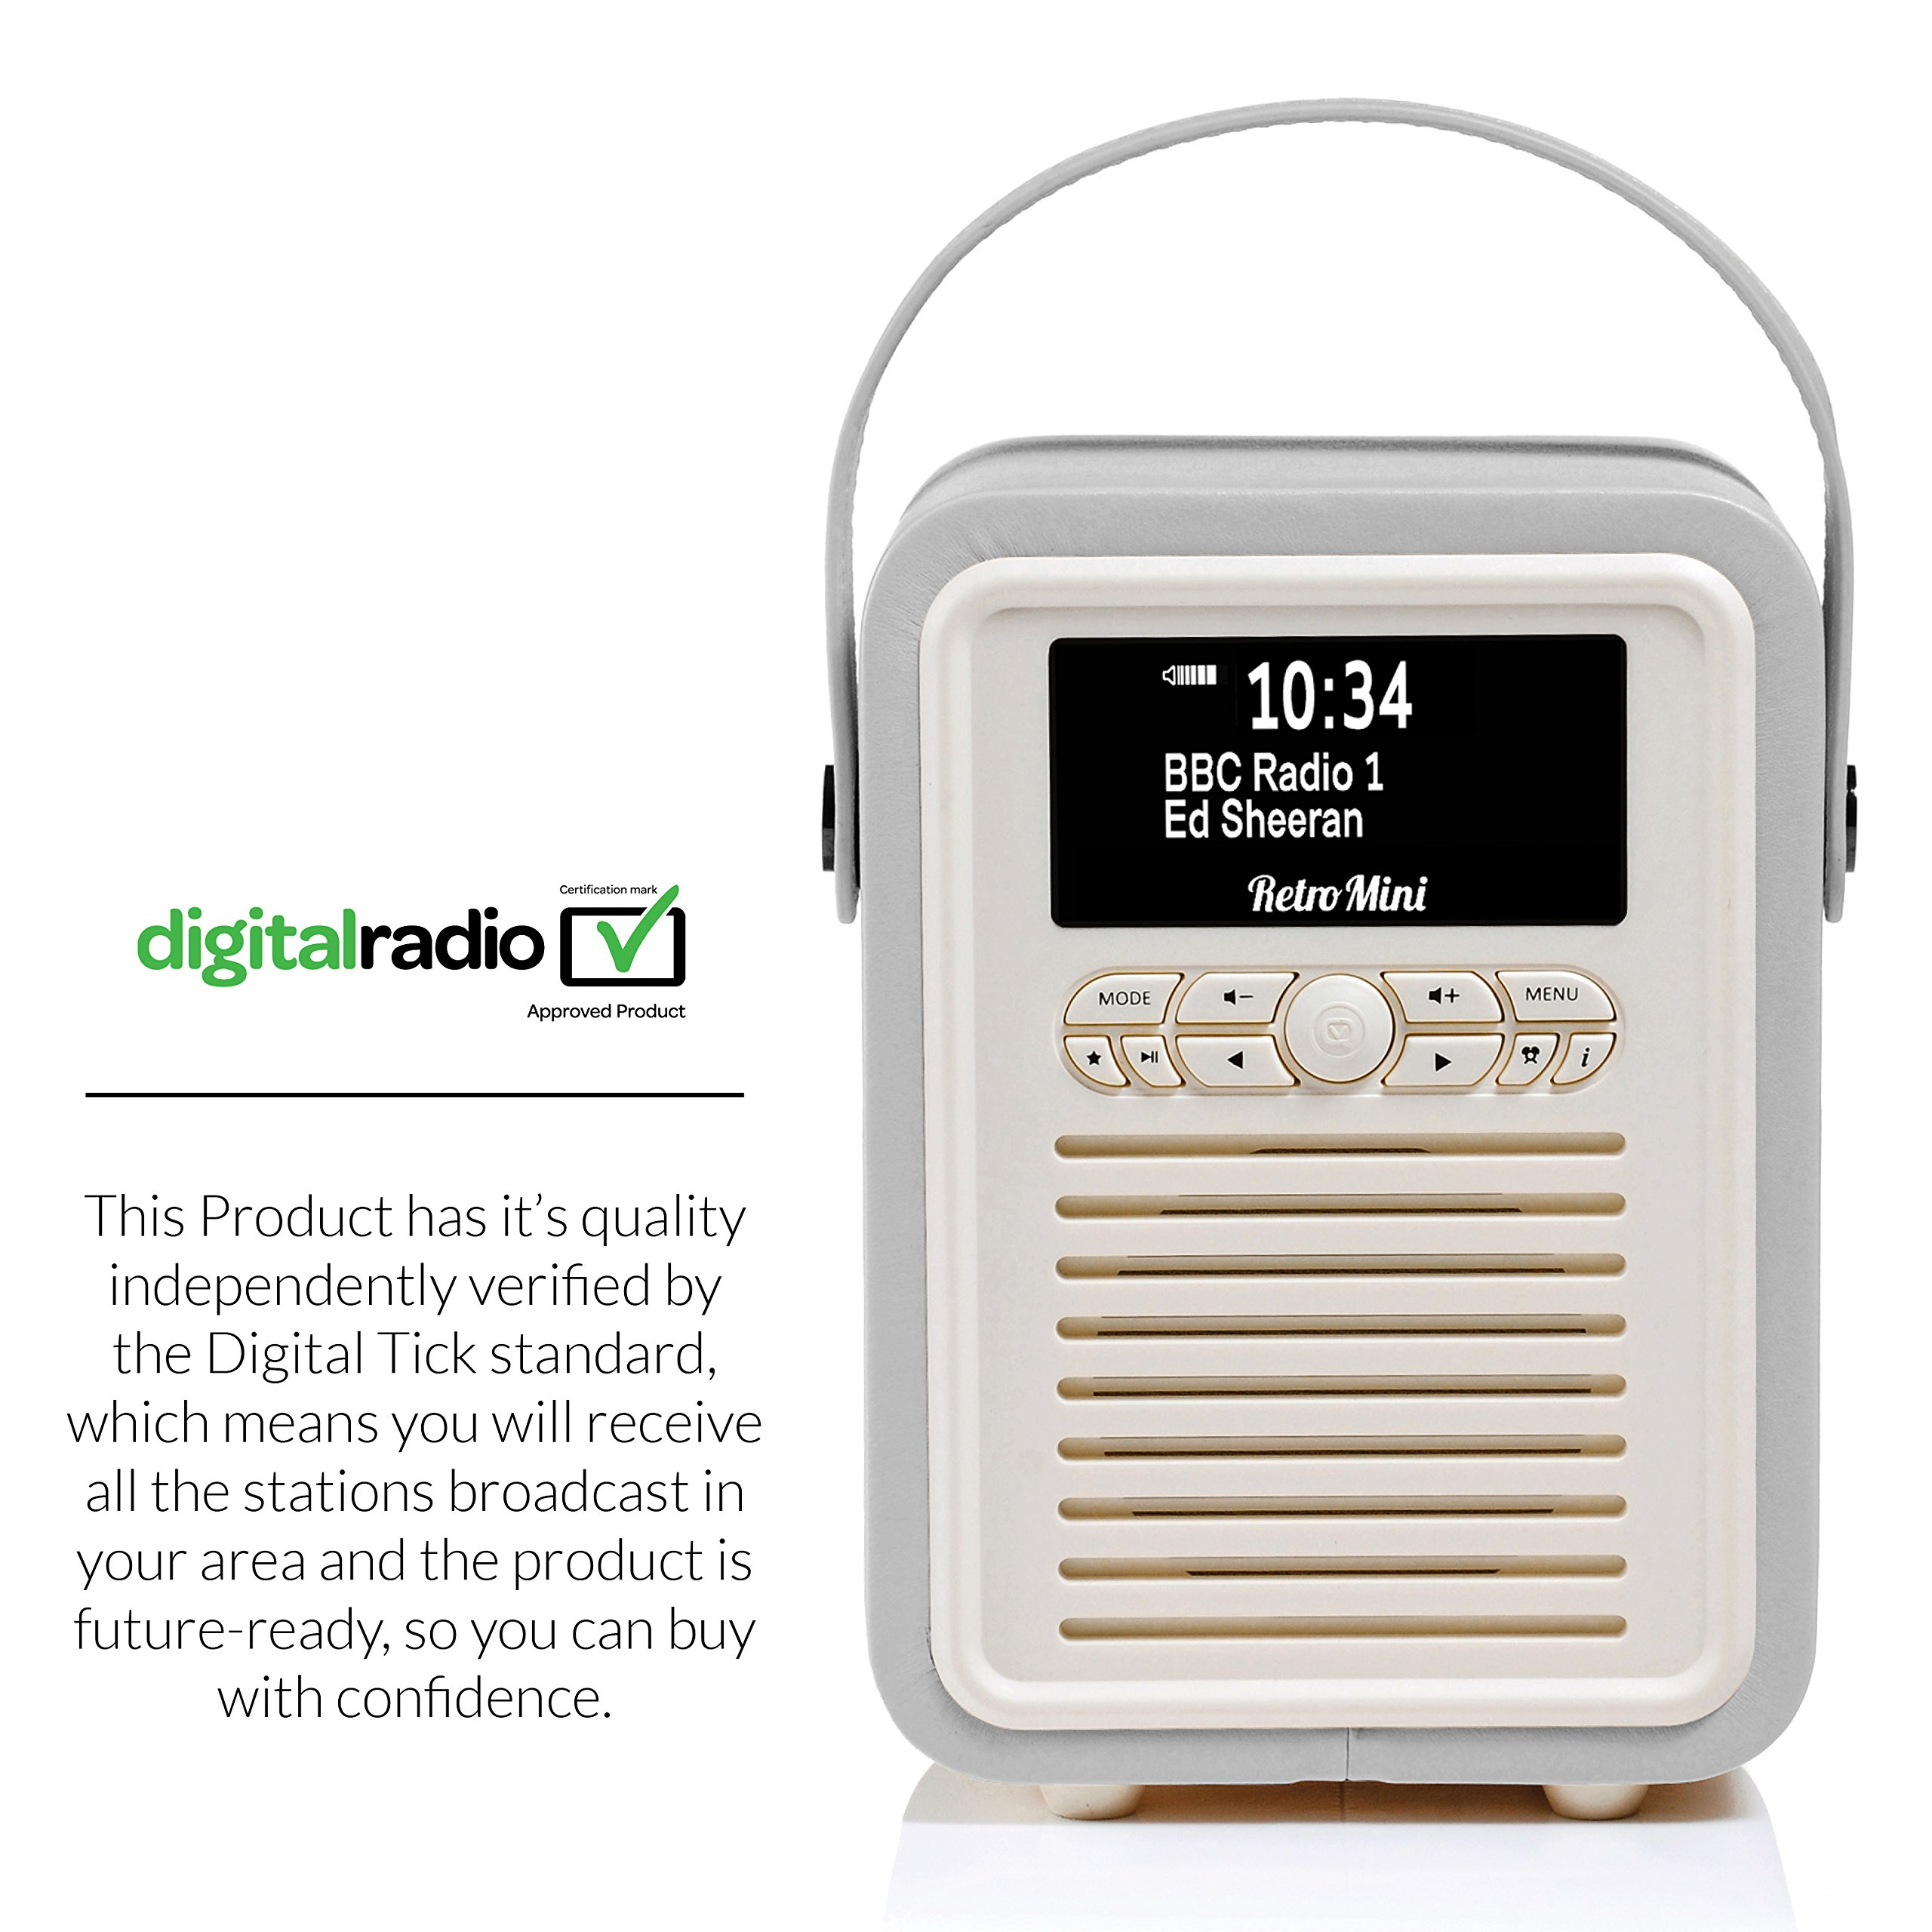 Retro Mini by VQ   Radio & Bluetooth Speaker with AM/FM & HD Radio, Dual Alarm Clock Mains or Battery – Premium PU Leather Case Light Grey by VQ (Image #3)